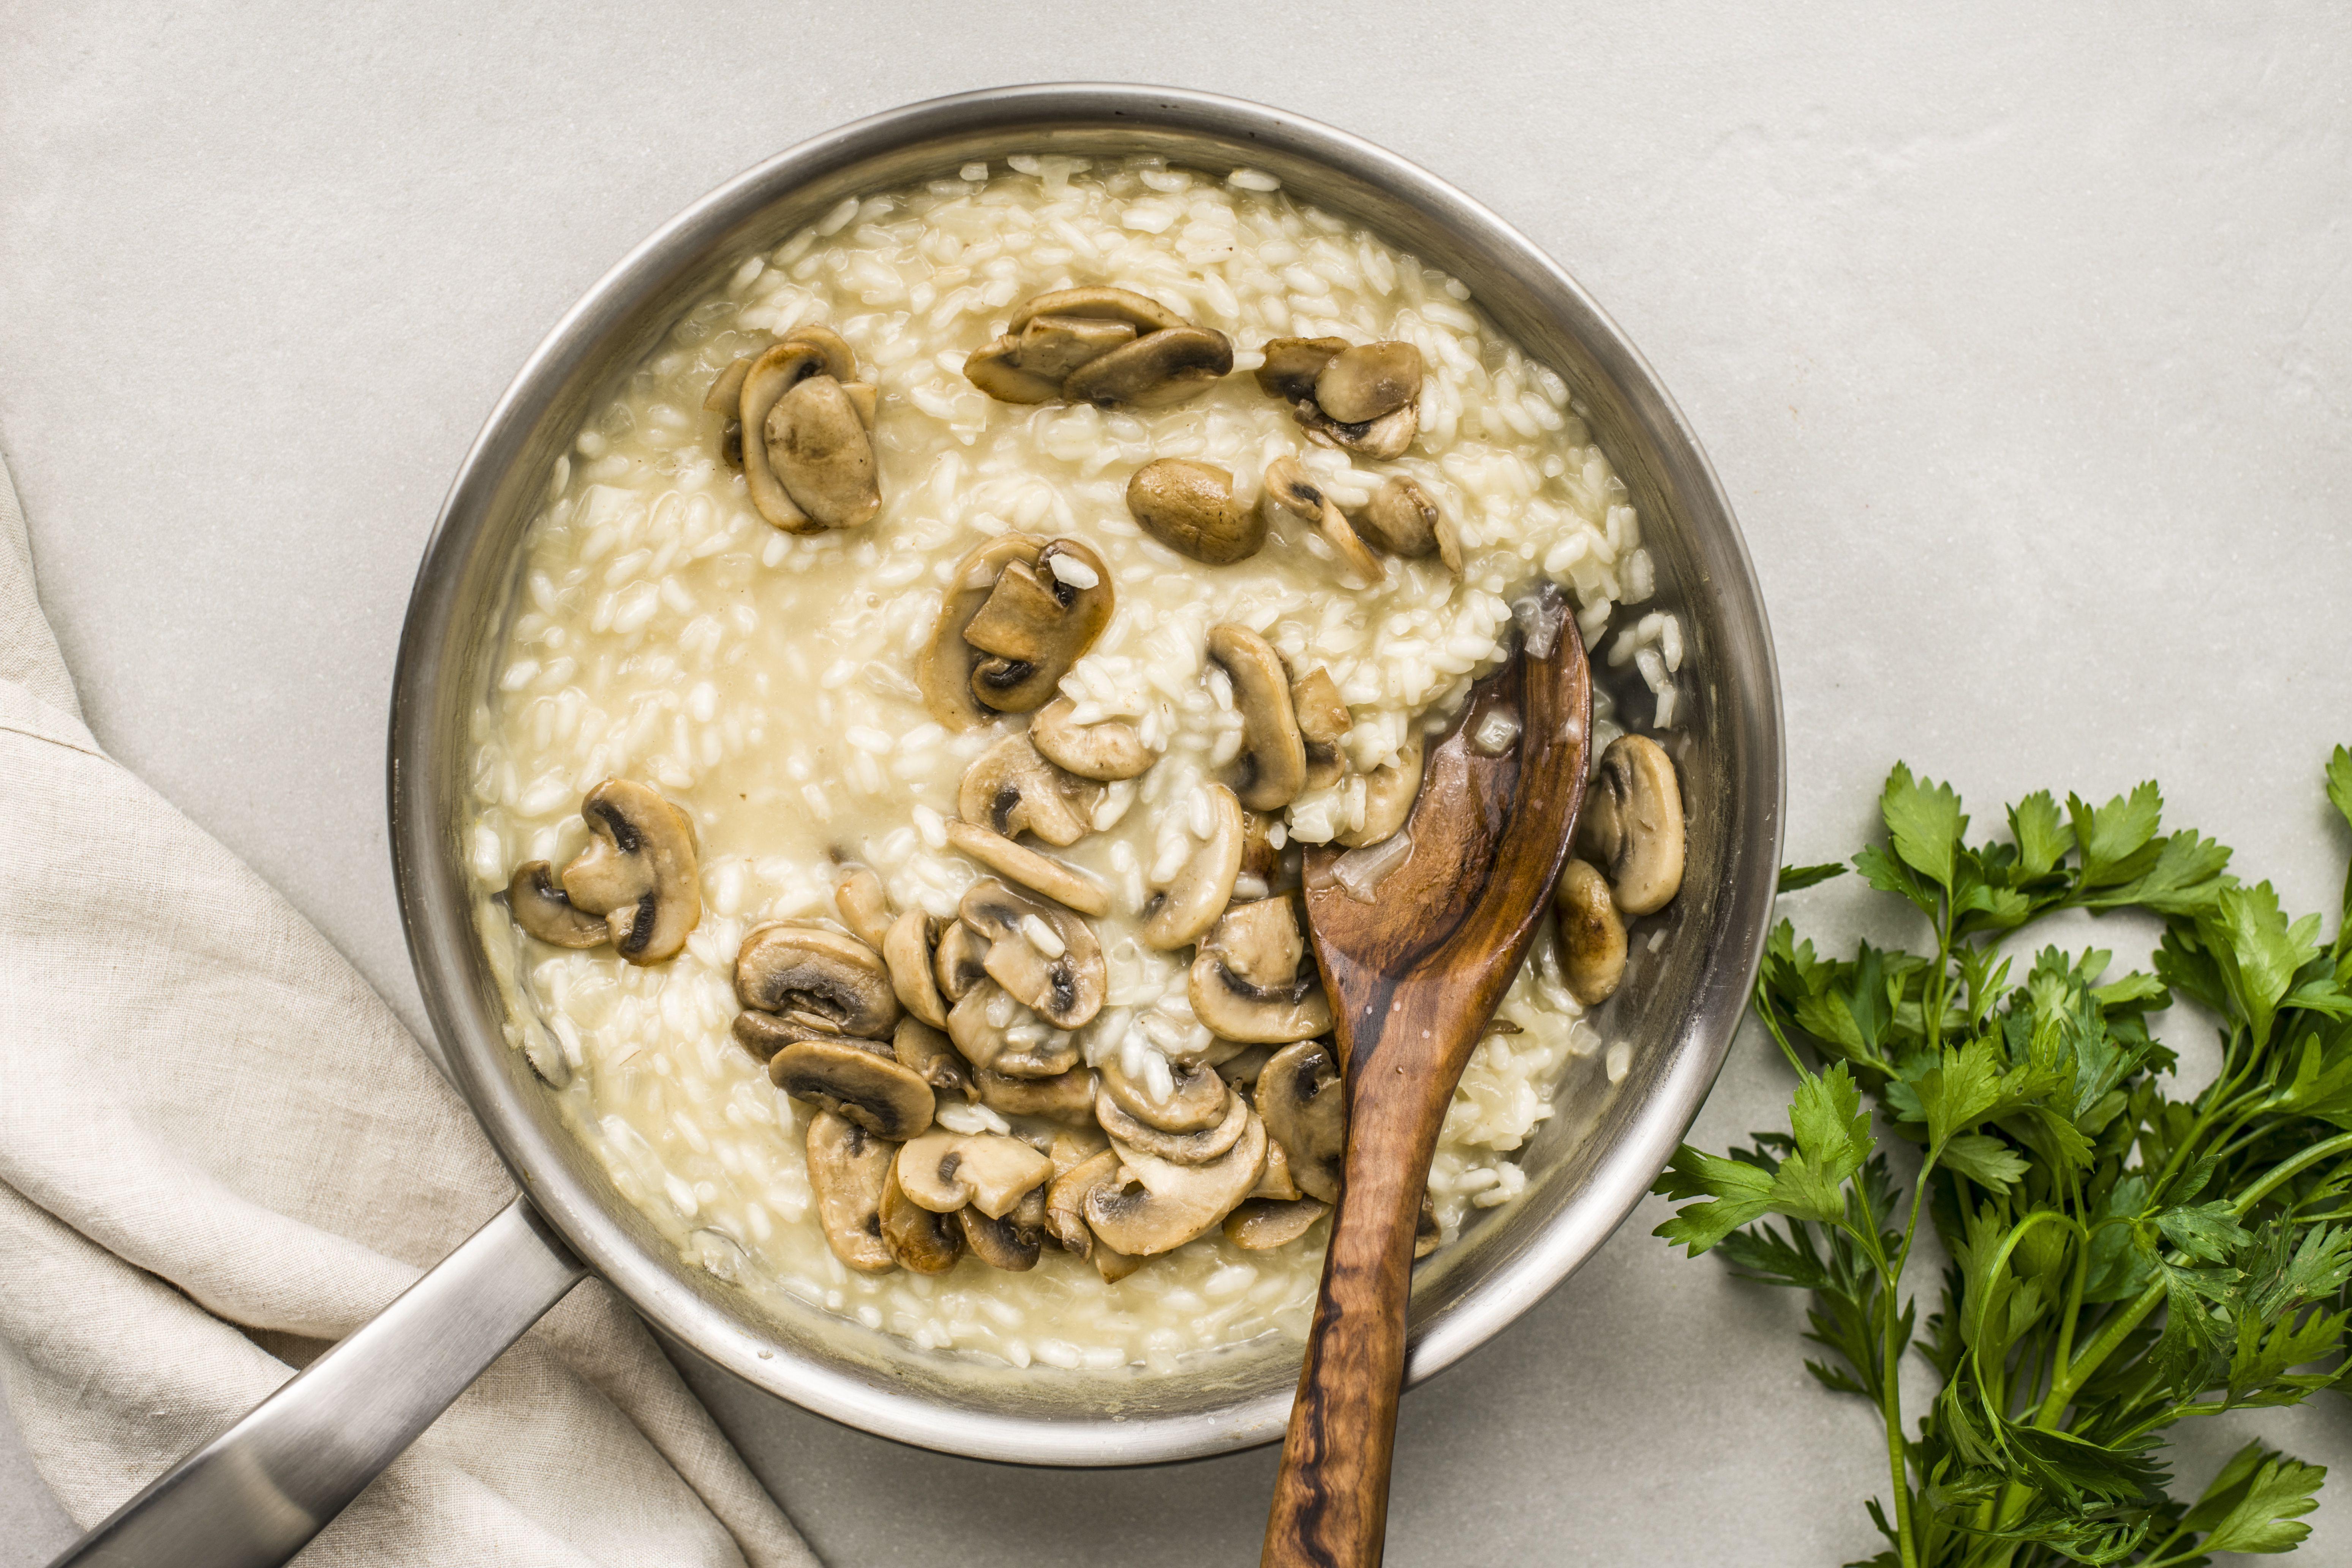 Add mushrooms to pan of rice